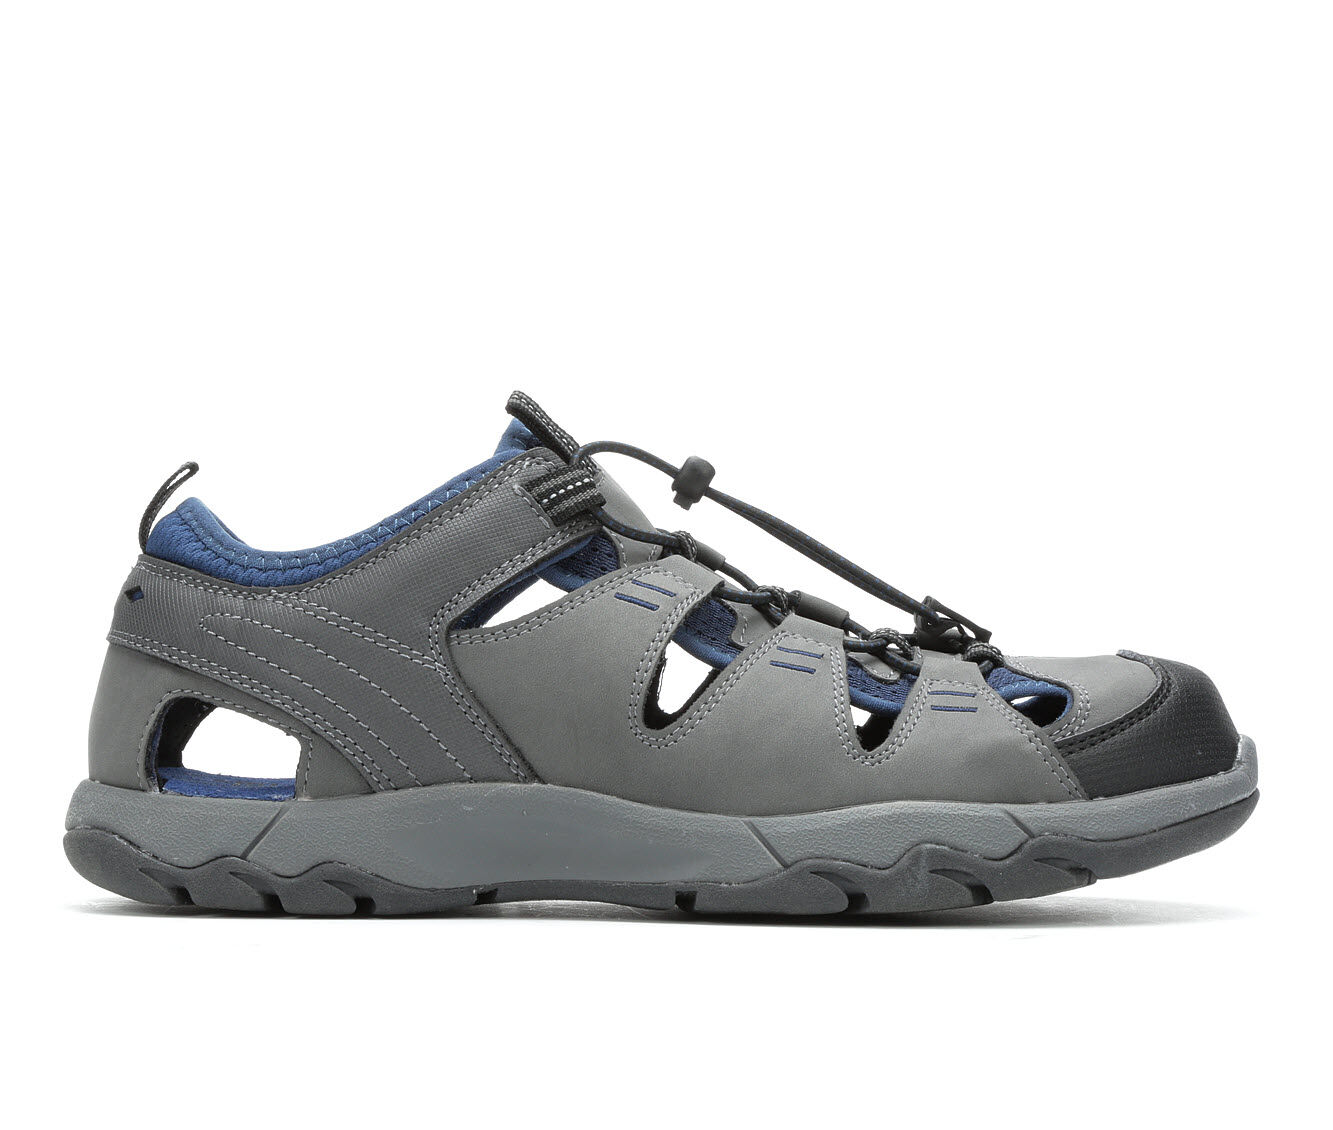 Men's Gotcha Eastwood Outdoor Sandals Grey